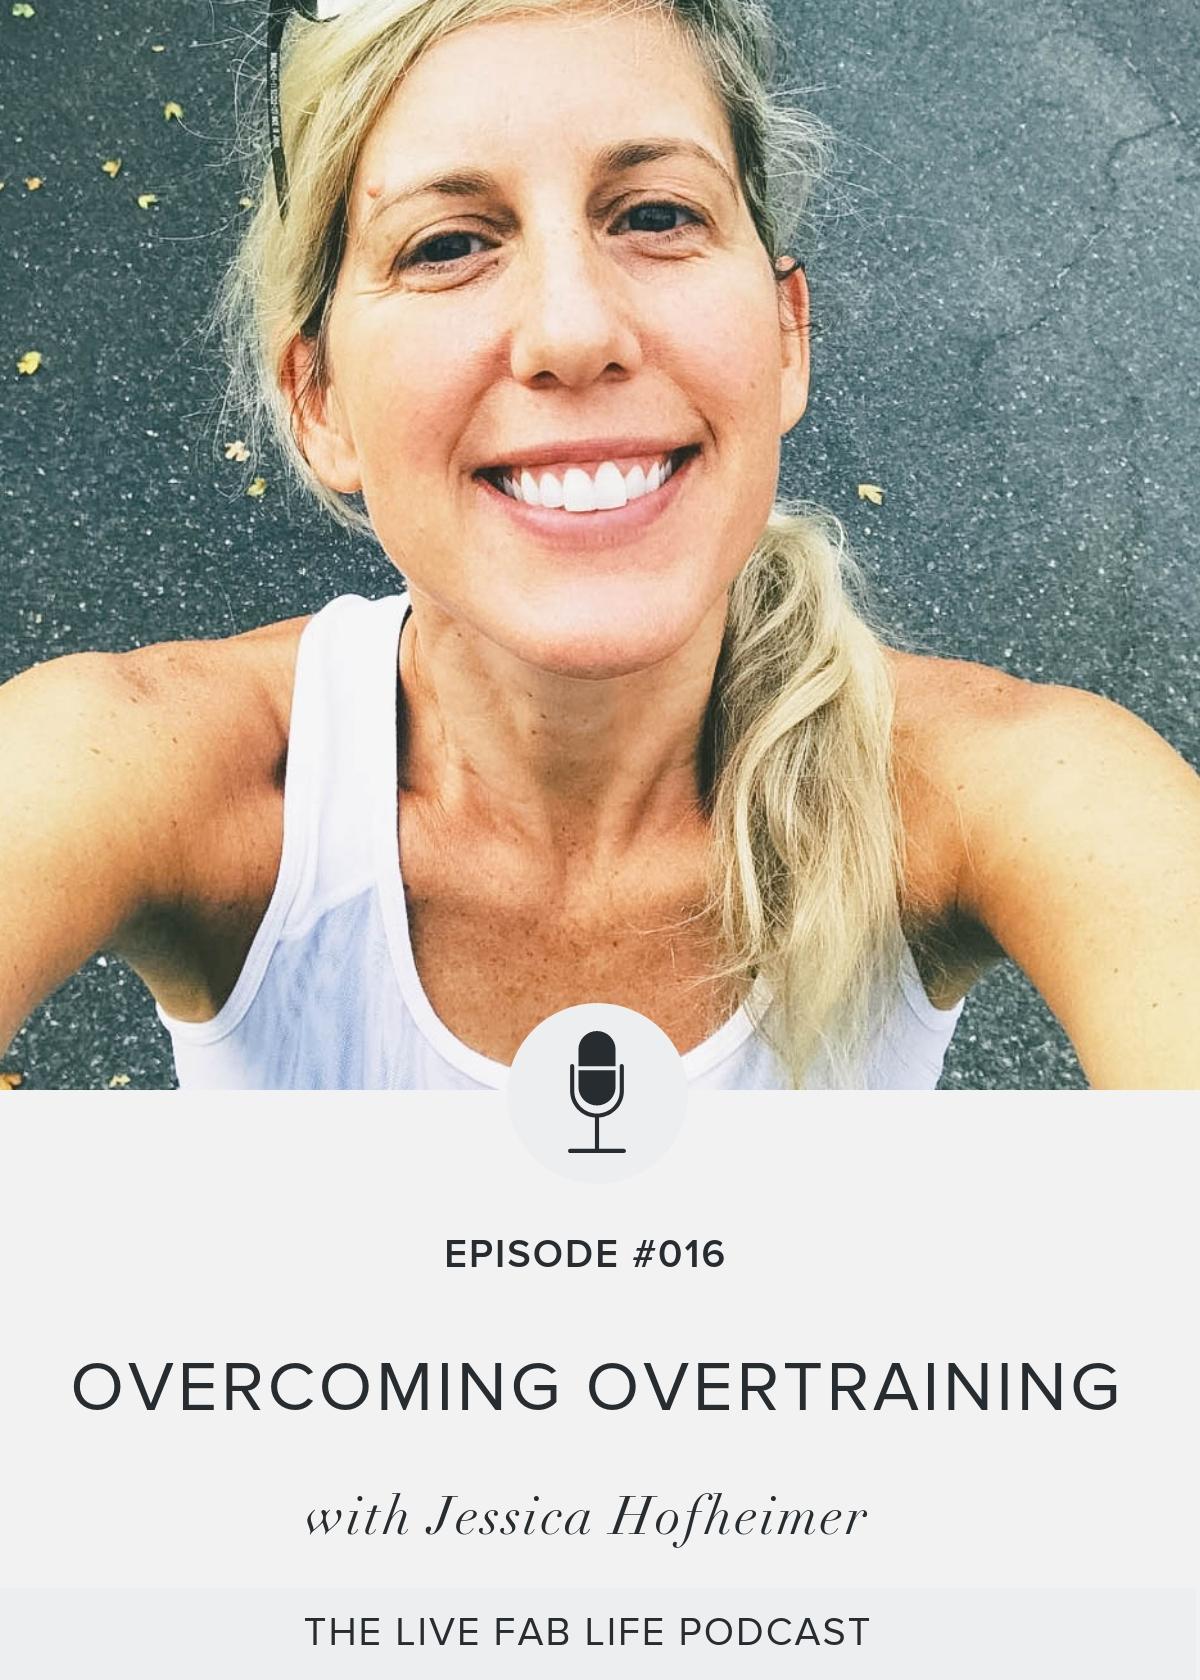 Episode 016: Overcoming Overtraining with Jessica Hofheimer